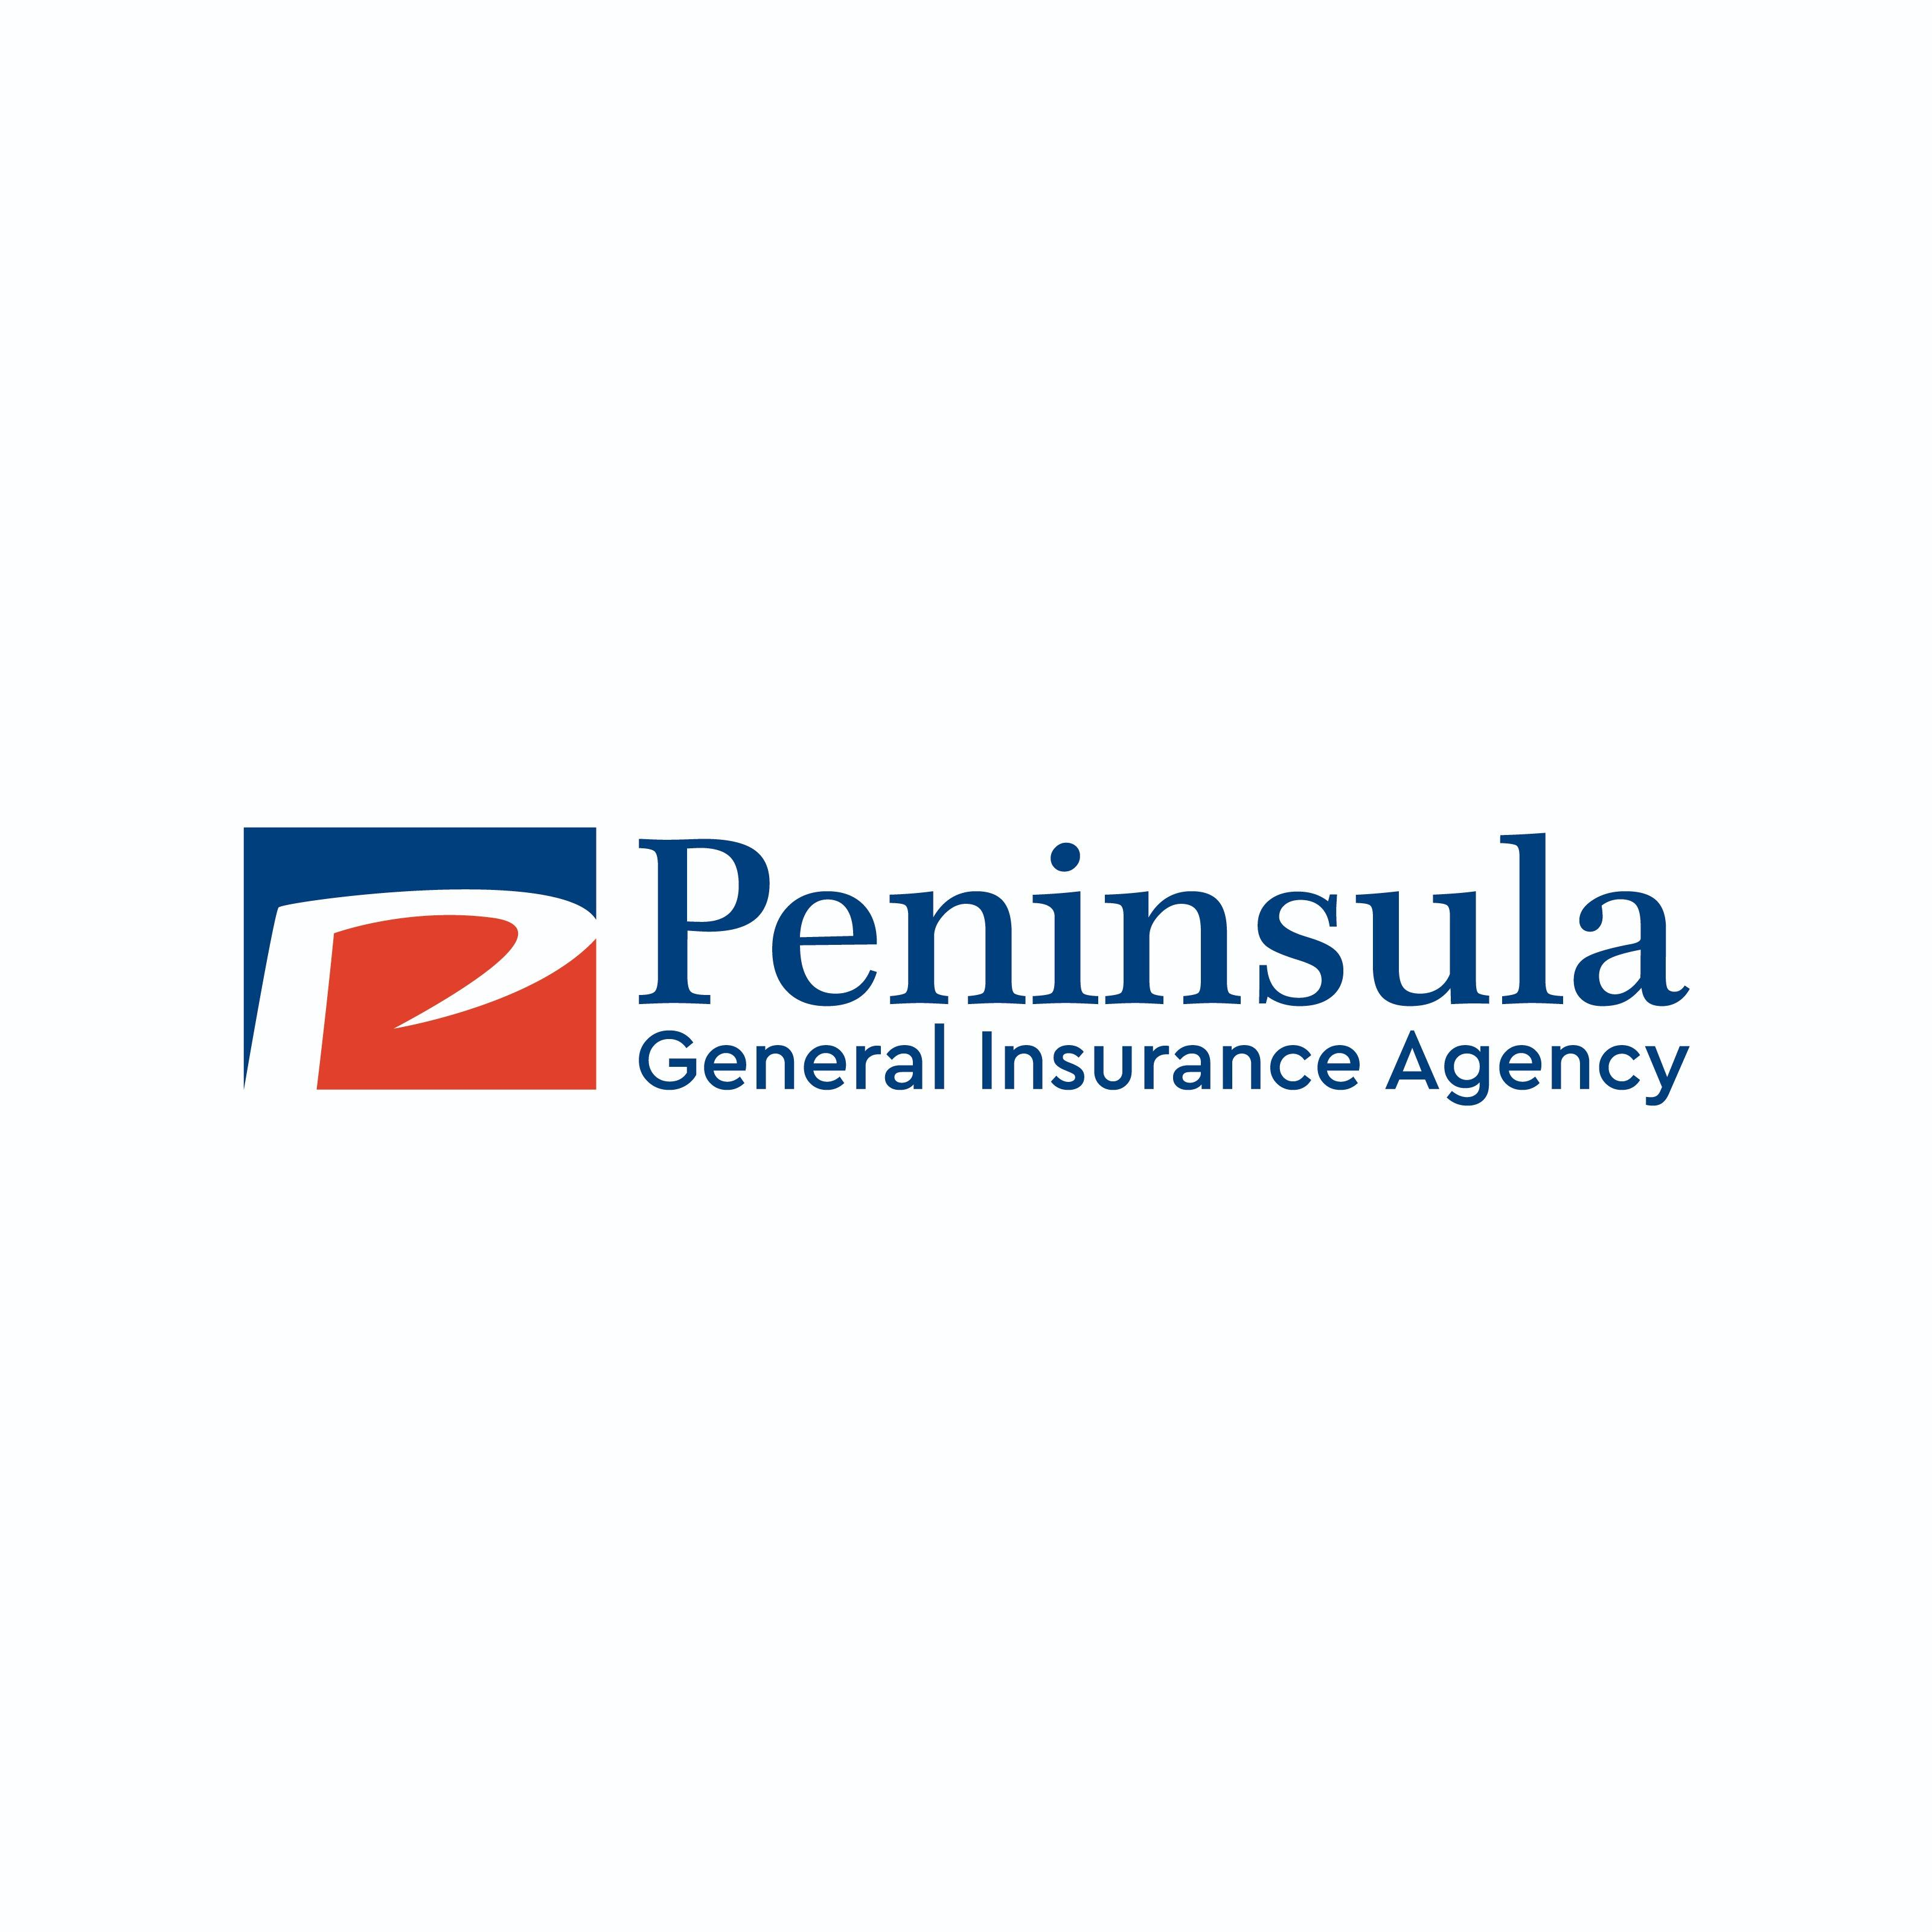 Peninsula General Insurance Agency A Mercury Insurance